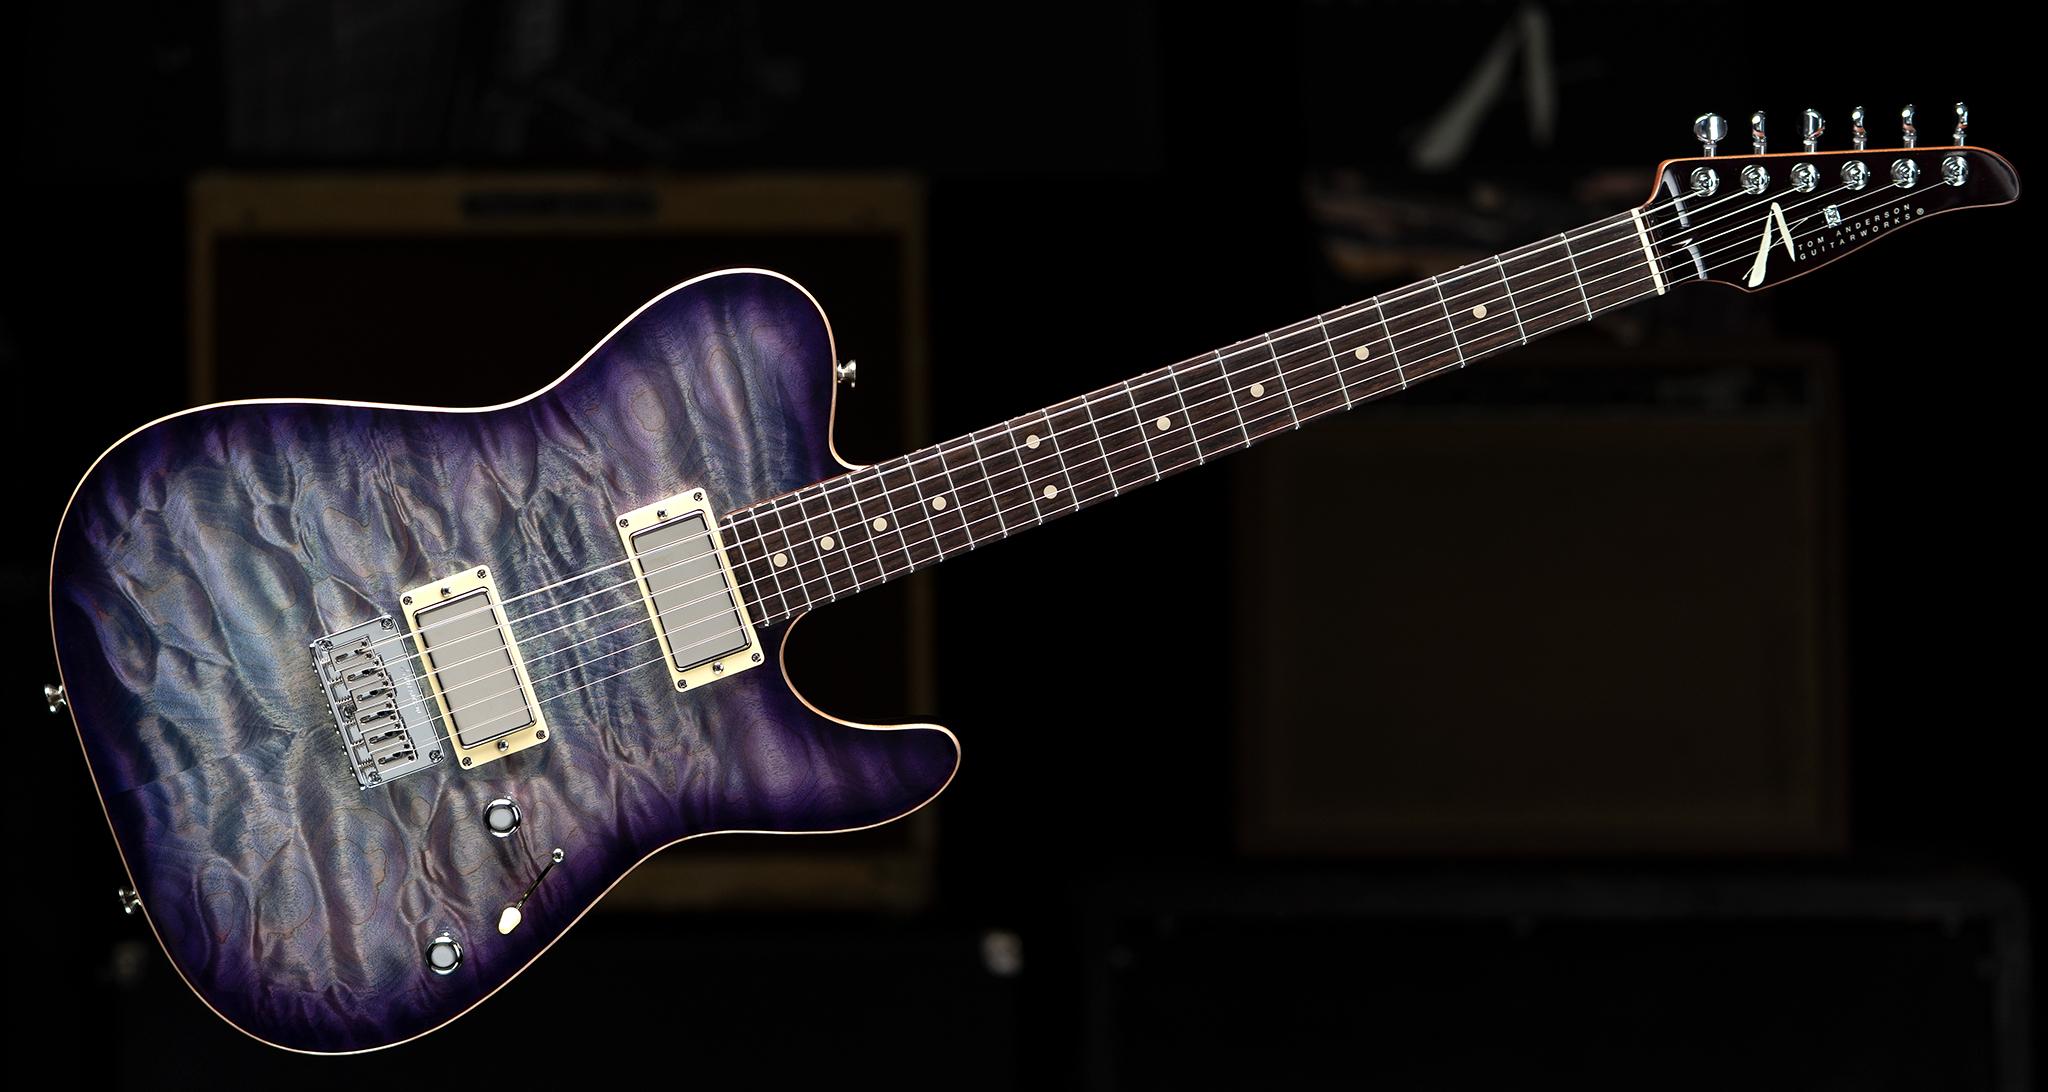 03-21-19P_f_Cobra_Abalone to T-Purple Burst.jpg